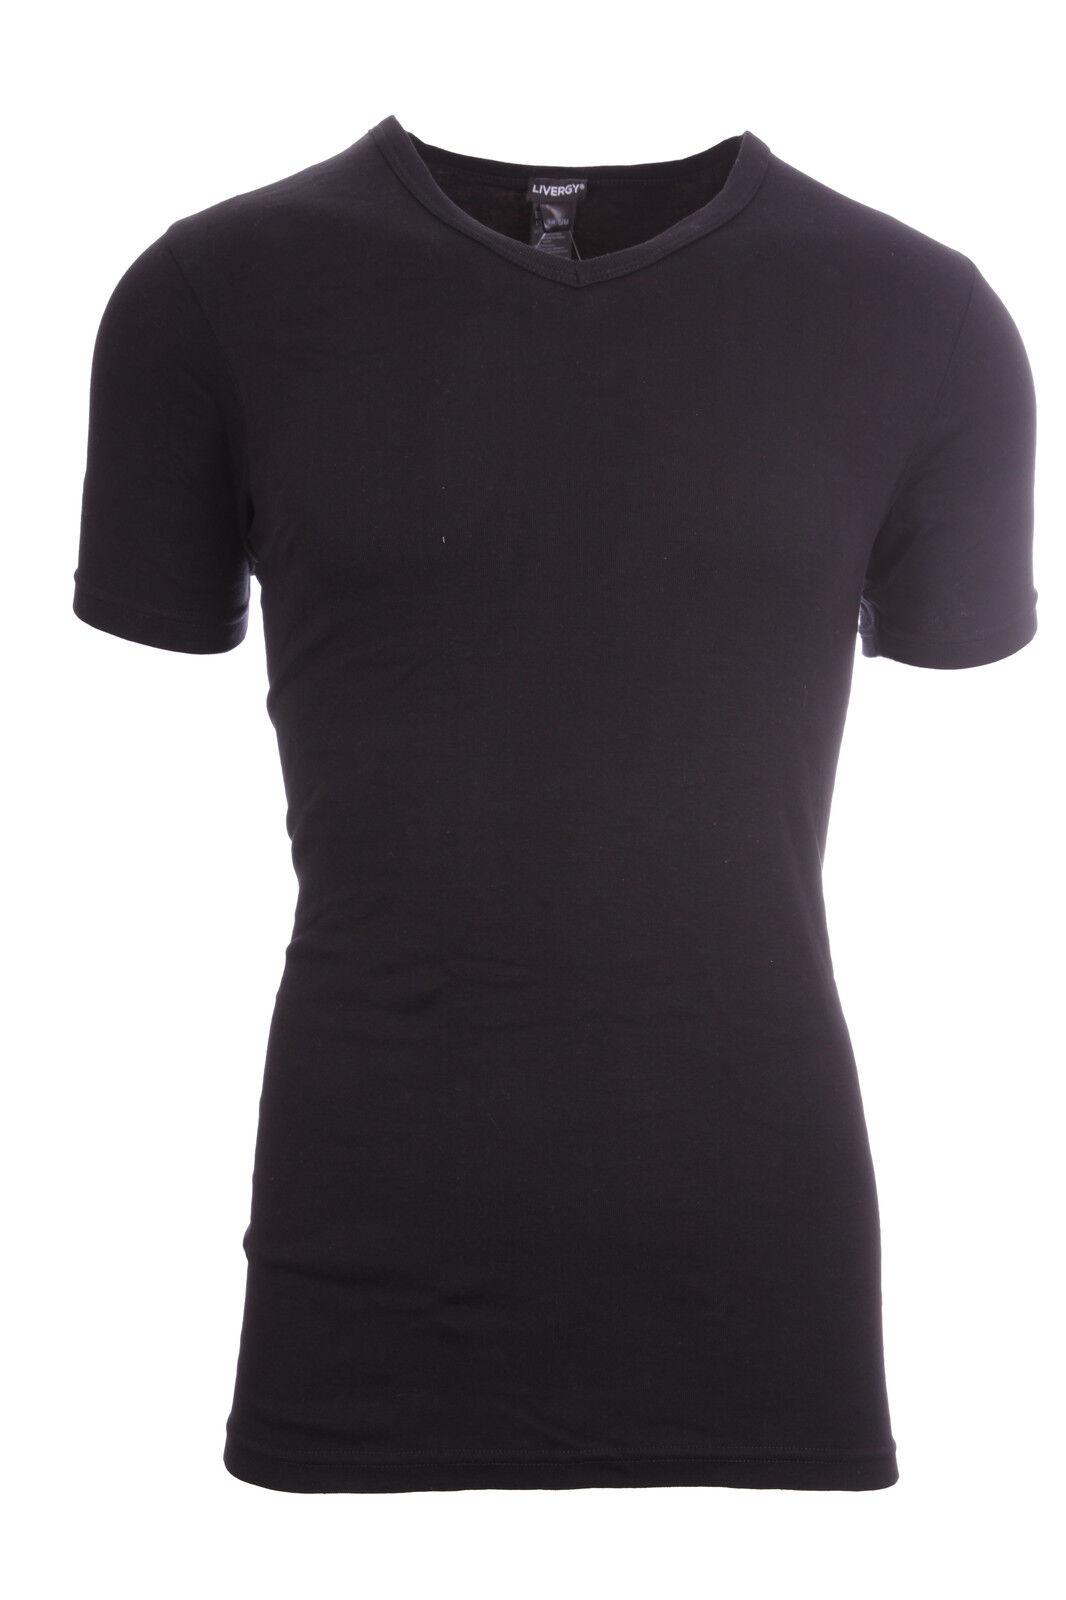 Black t shirt xl - Material 100 Cotton